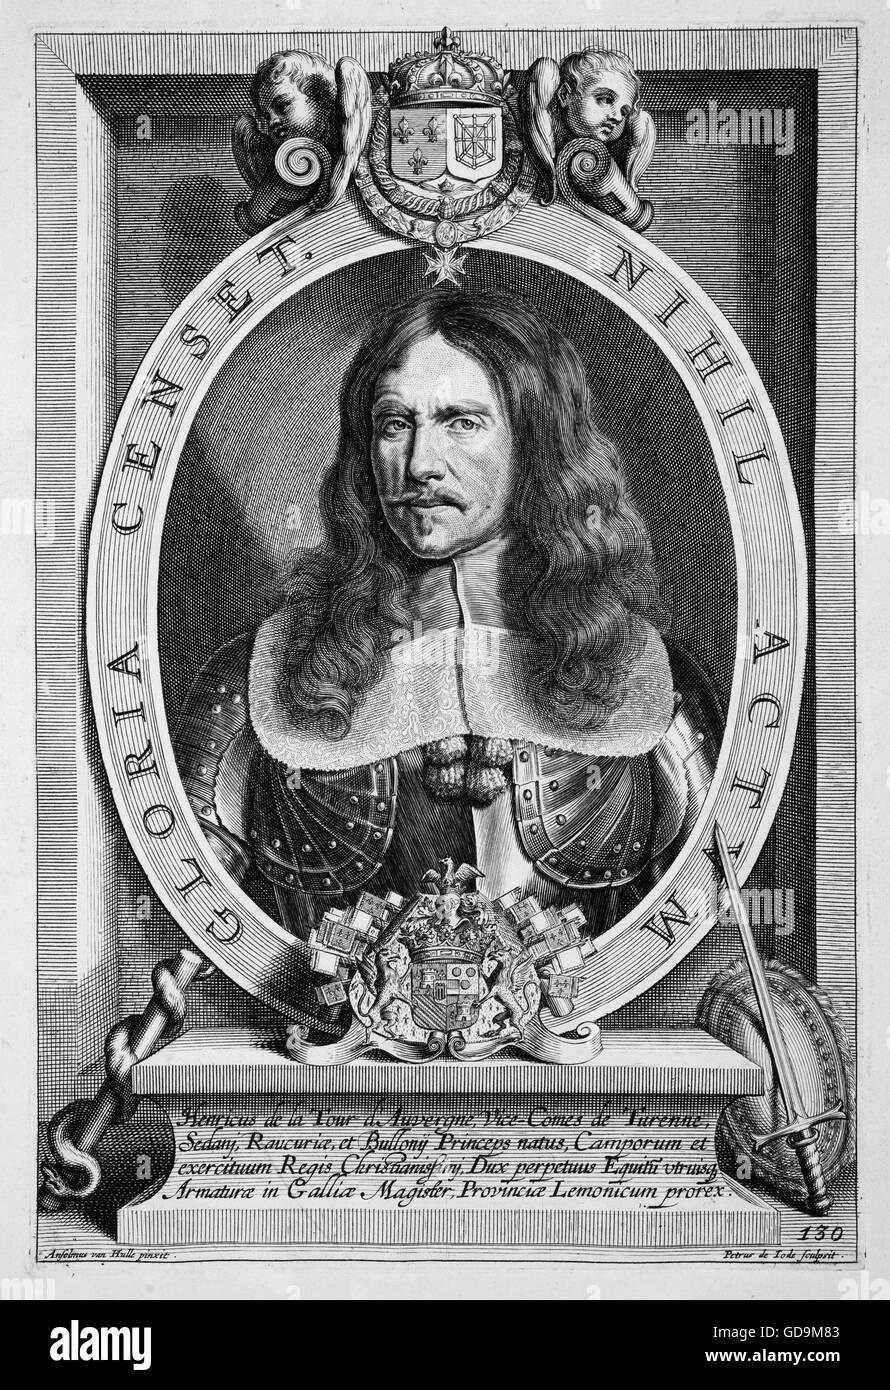 HENRI de la TOUR d'AUVERGNE, Vicomte de Turenne (1611-1675) French army commander and Marshal of France. Engraving - Stock Image